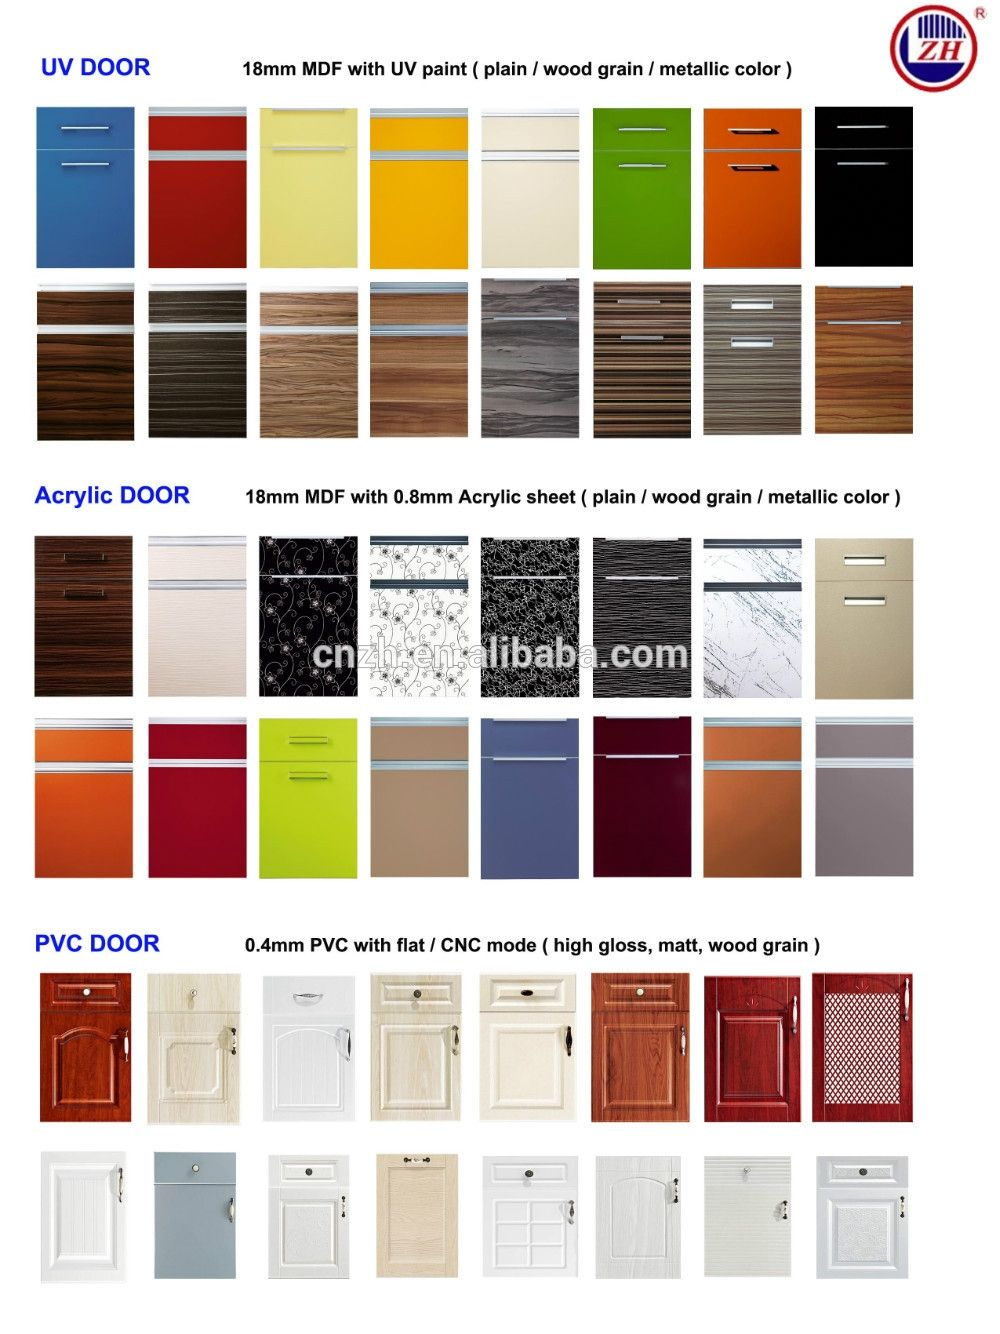 High Gloss Acrylic Kitchen Cabinet Doors High Gloss Kitchen Cabinets Gloss Kitchen Cabinets Kitchen Cabinet Doors